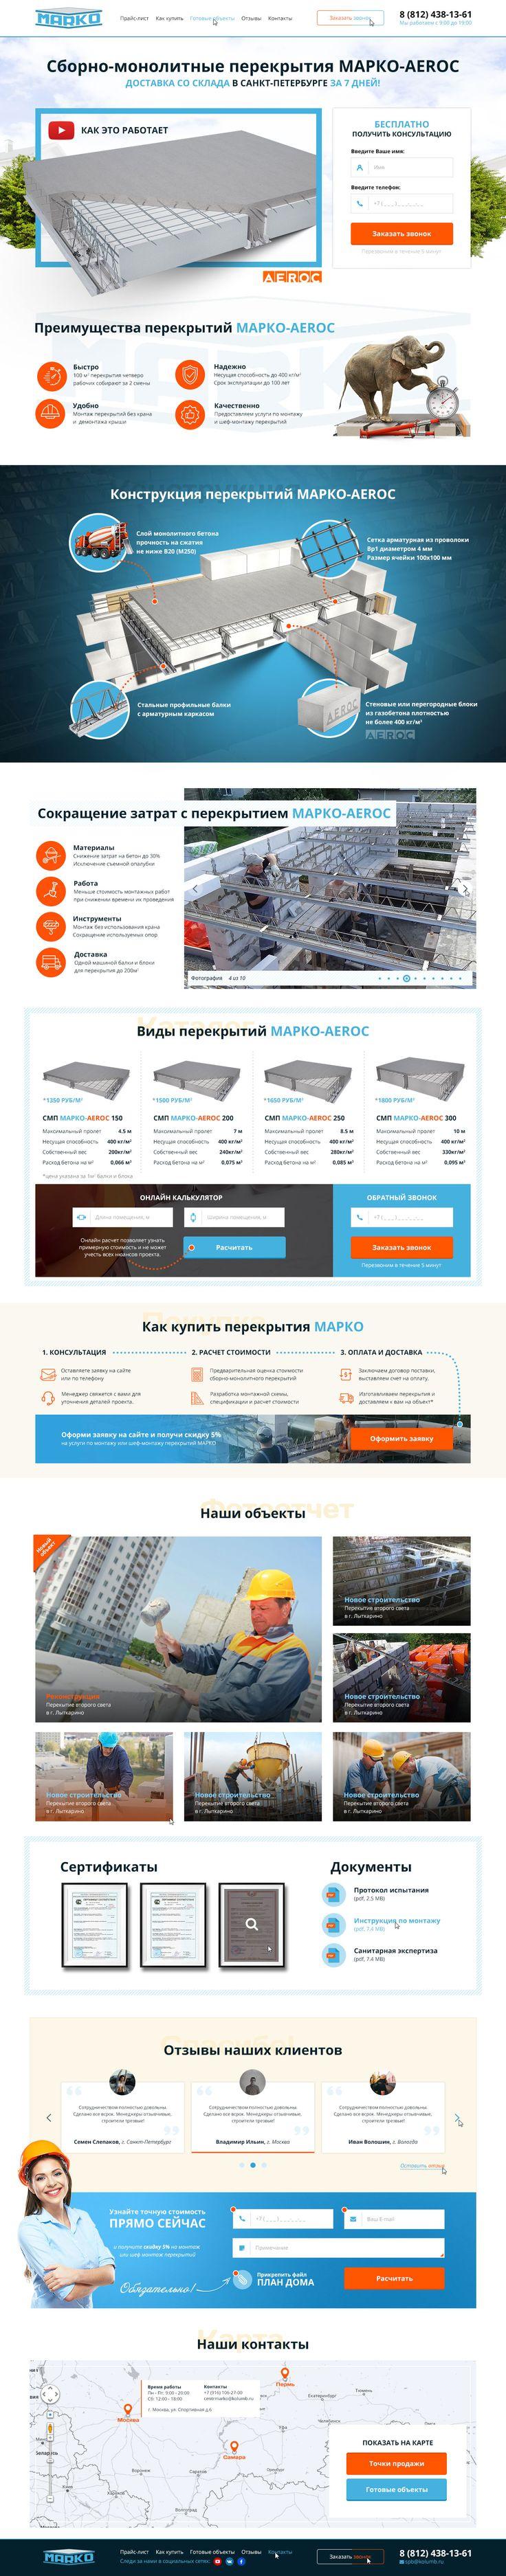 Landing Page для МАРКО-AEROC